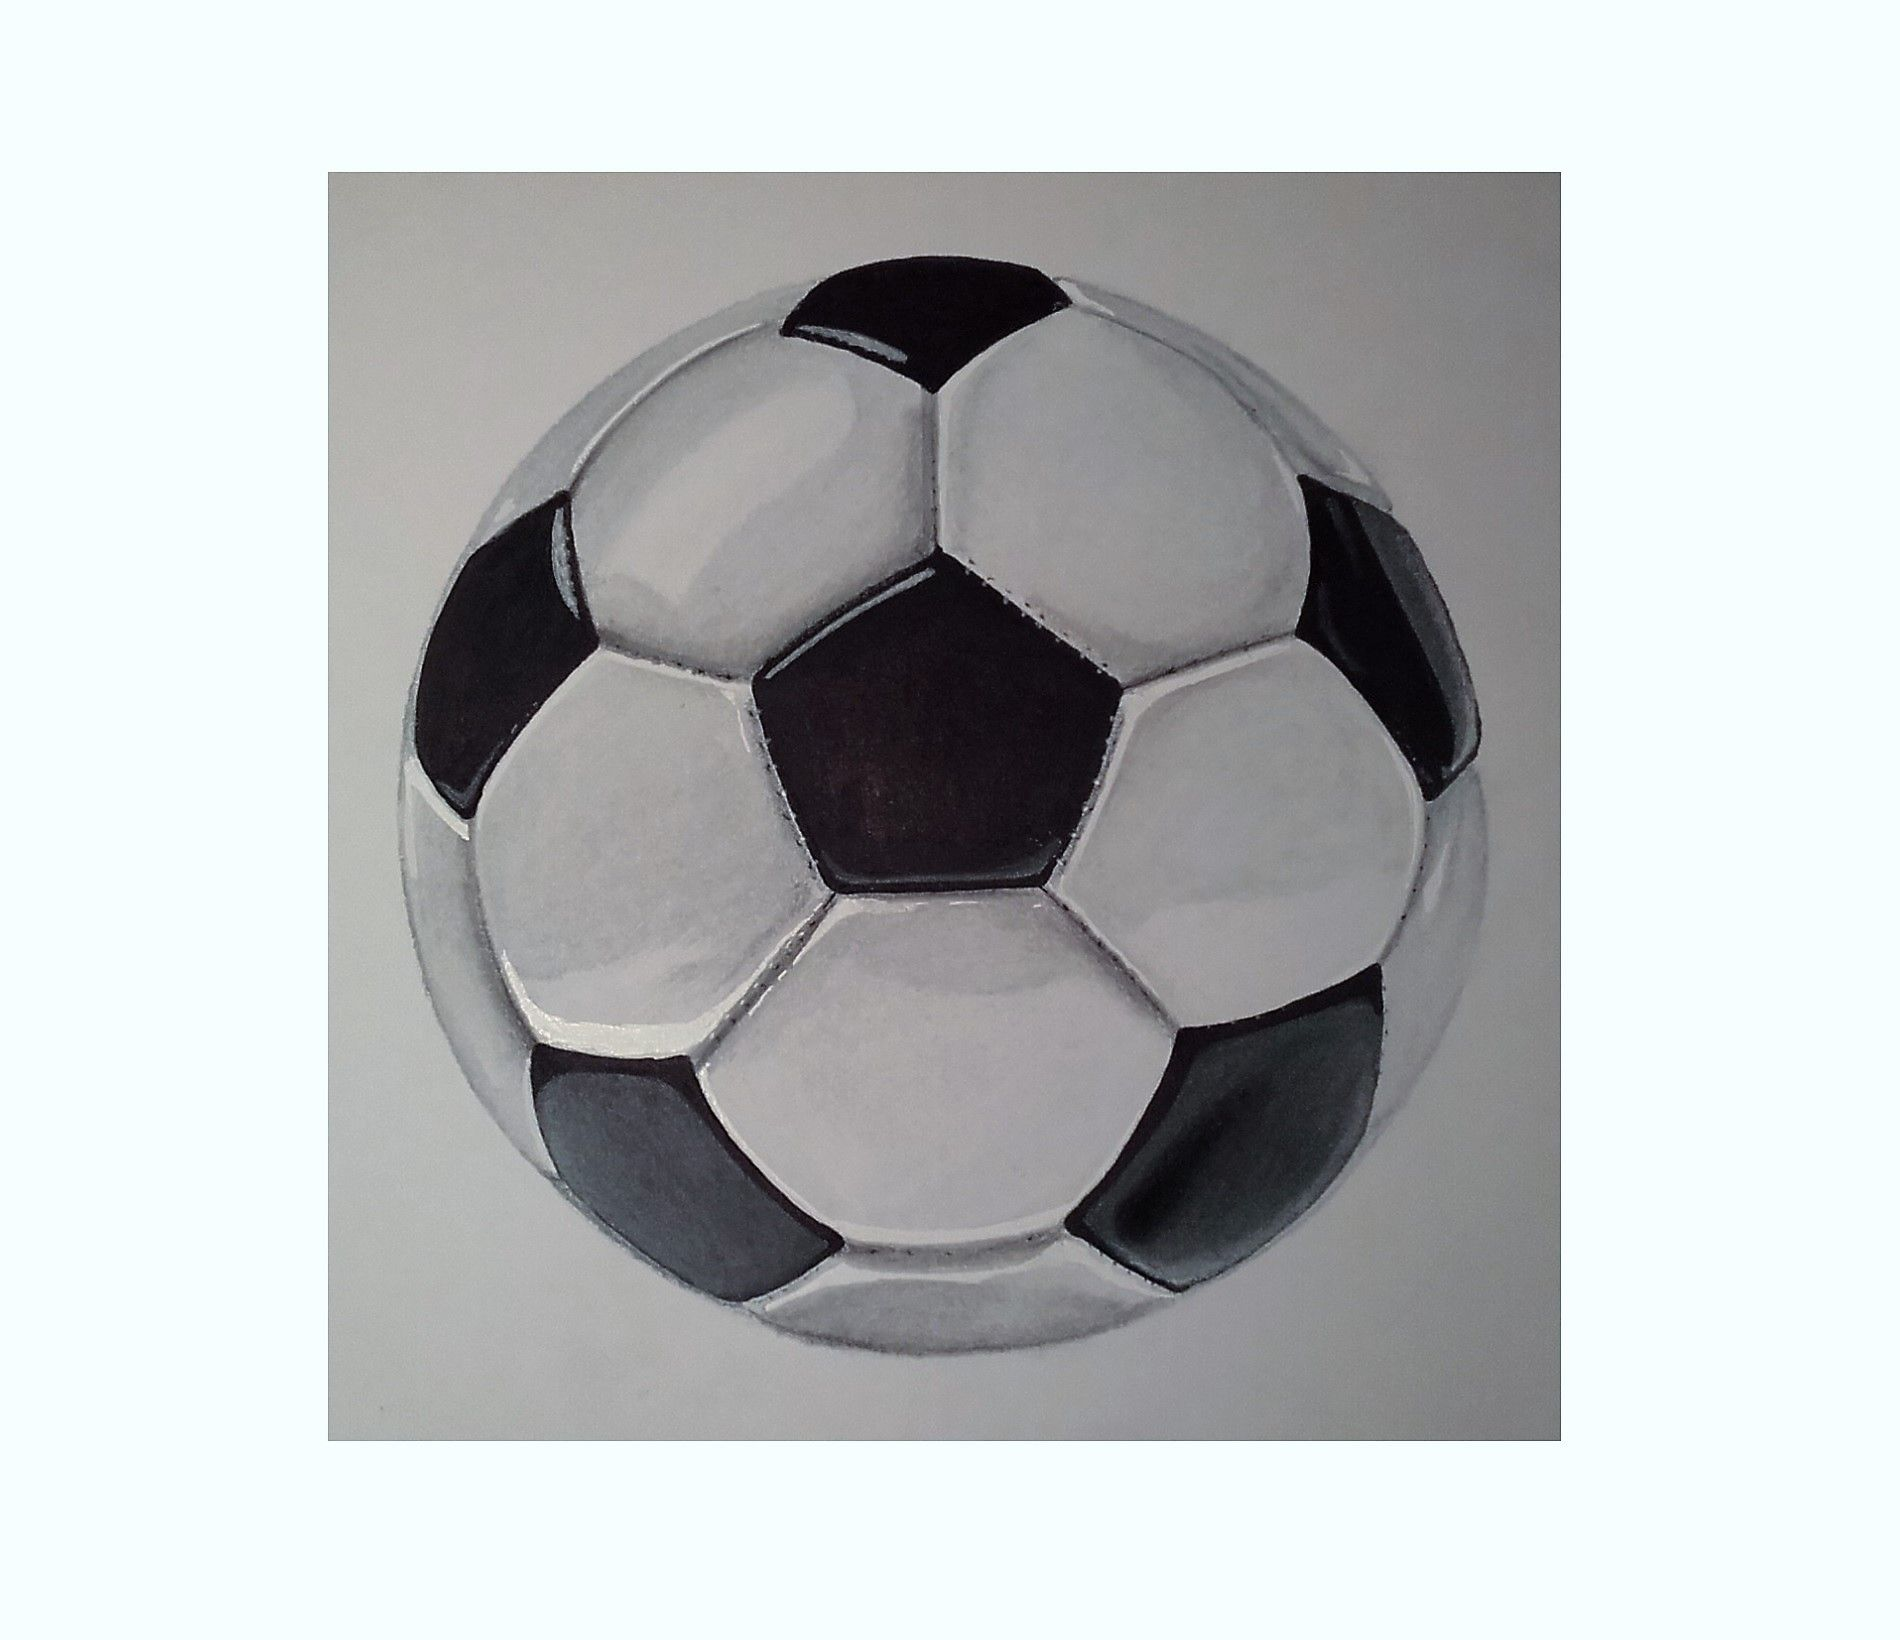 Dessin D Un Ballon Promarker Et Pastel Sec Dessin Promarker